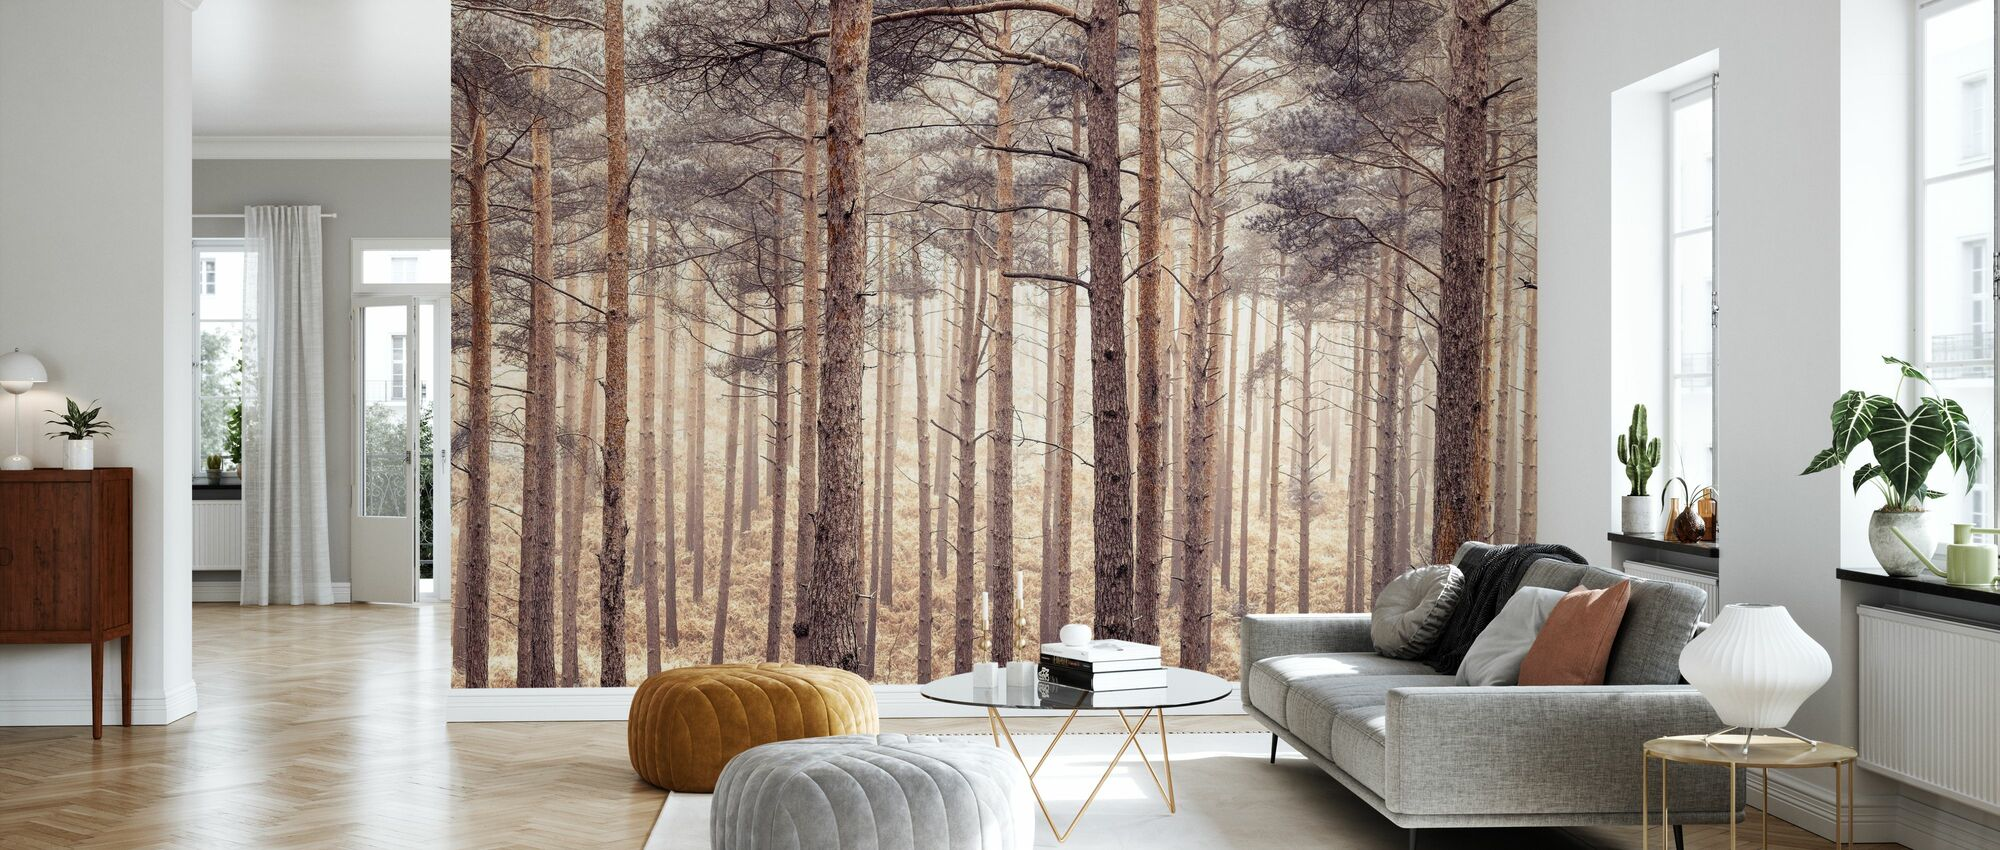 Forest - Wallpaper - Living Room